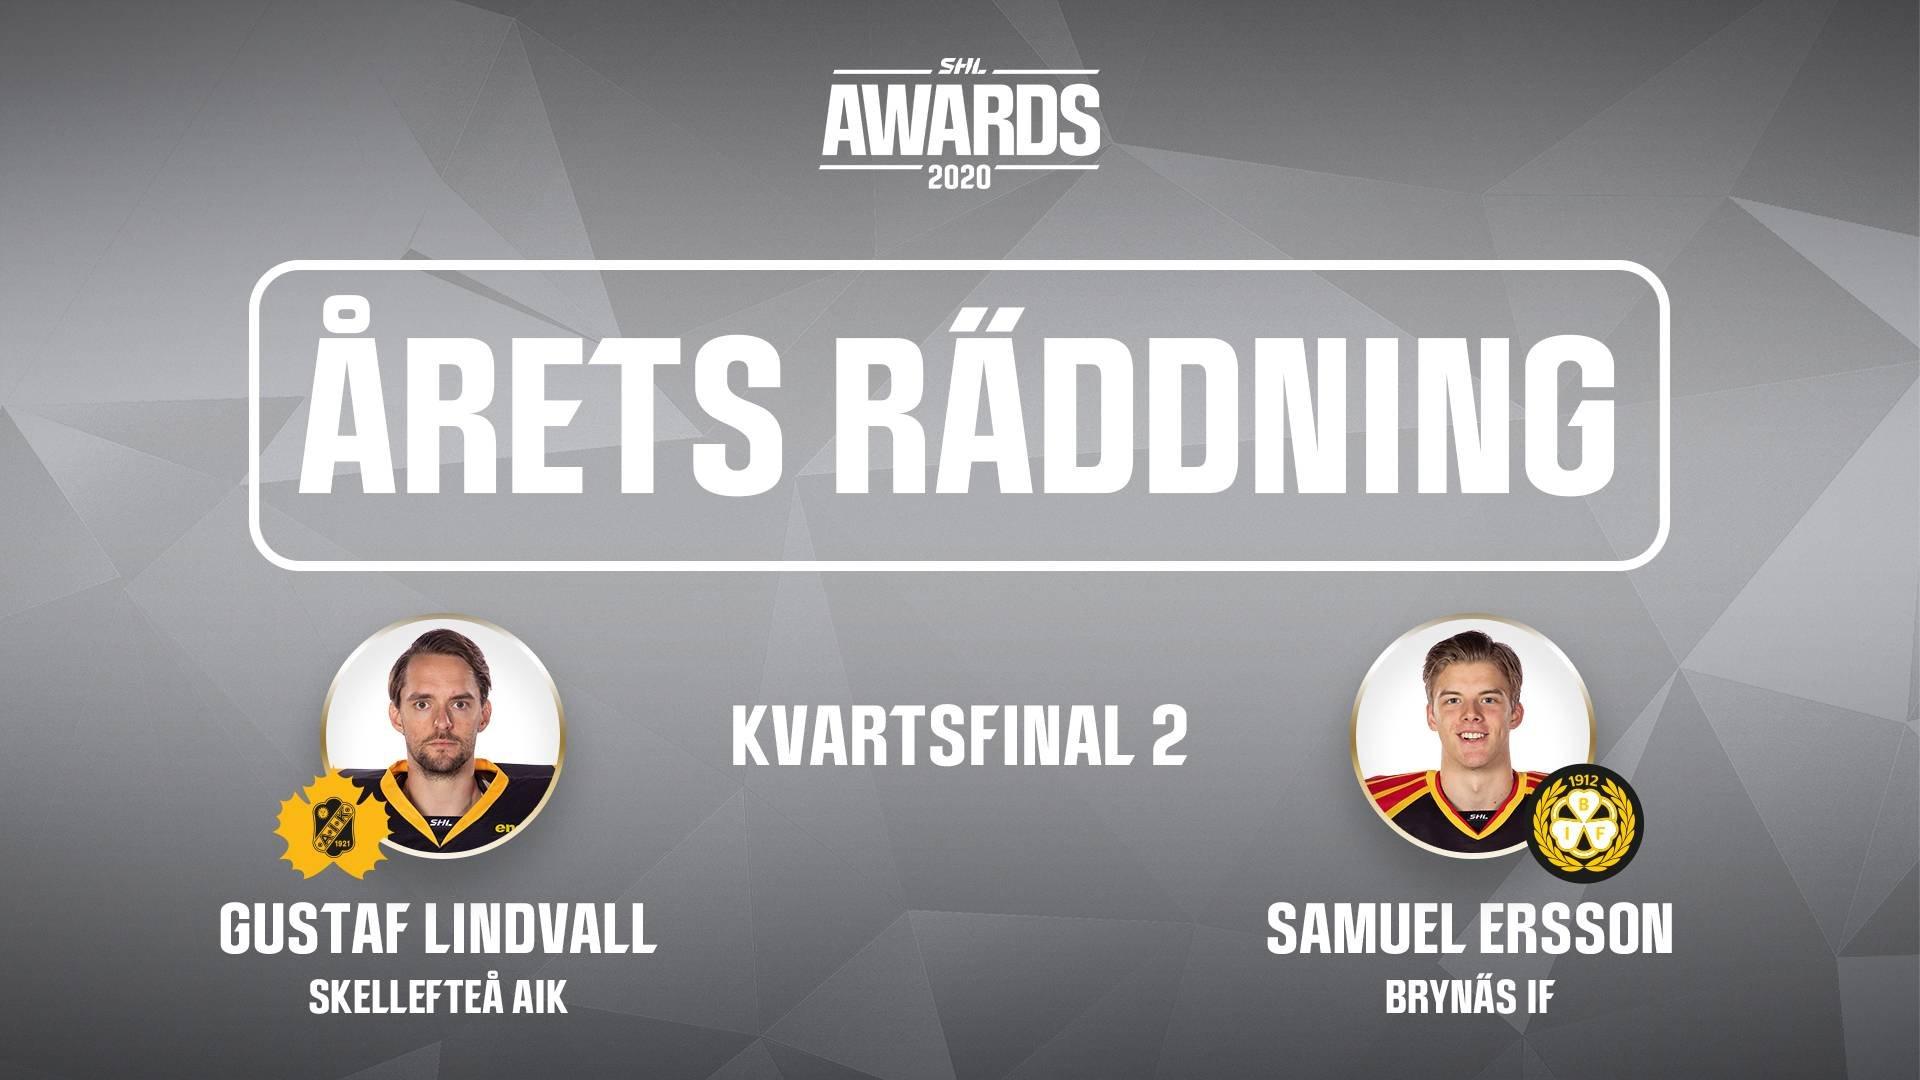 Årets räddning 2019/2020 - Kvartsfinal 2